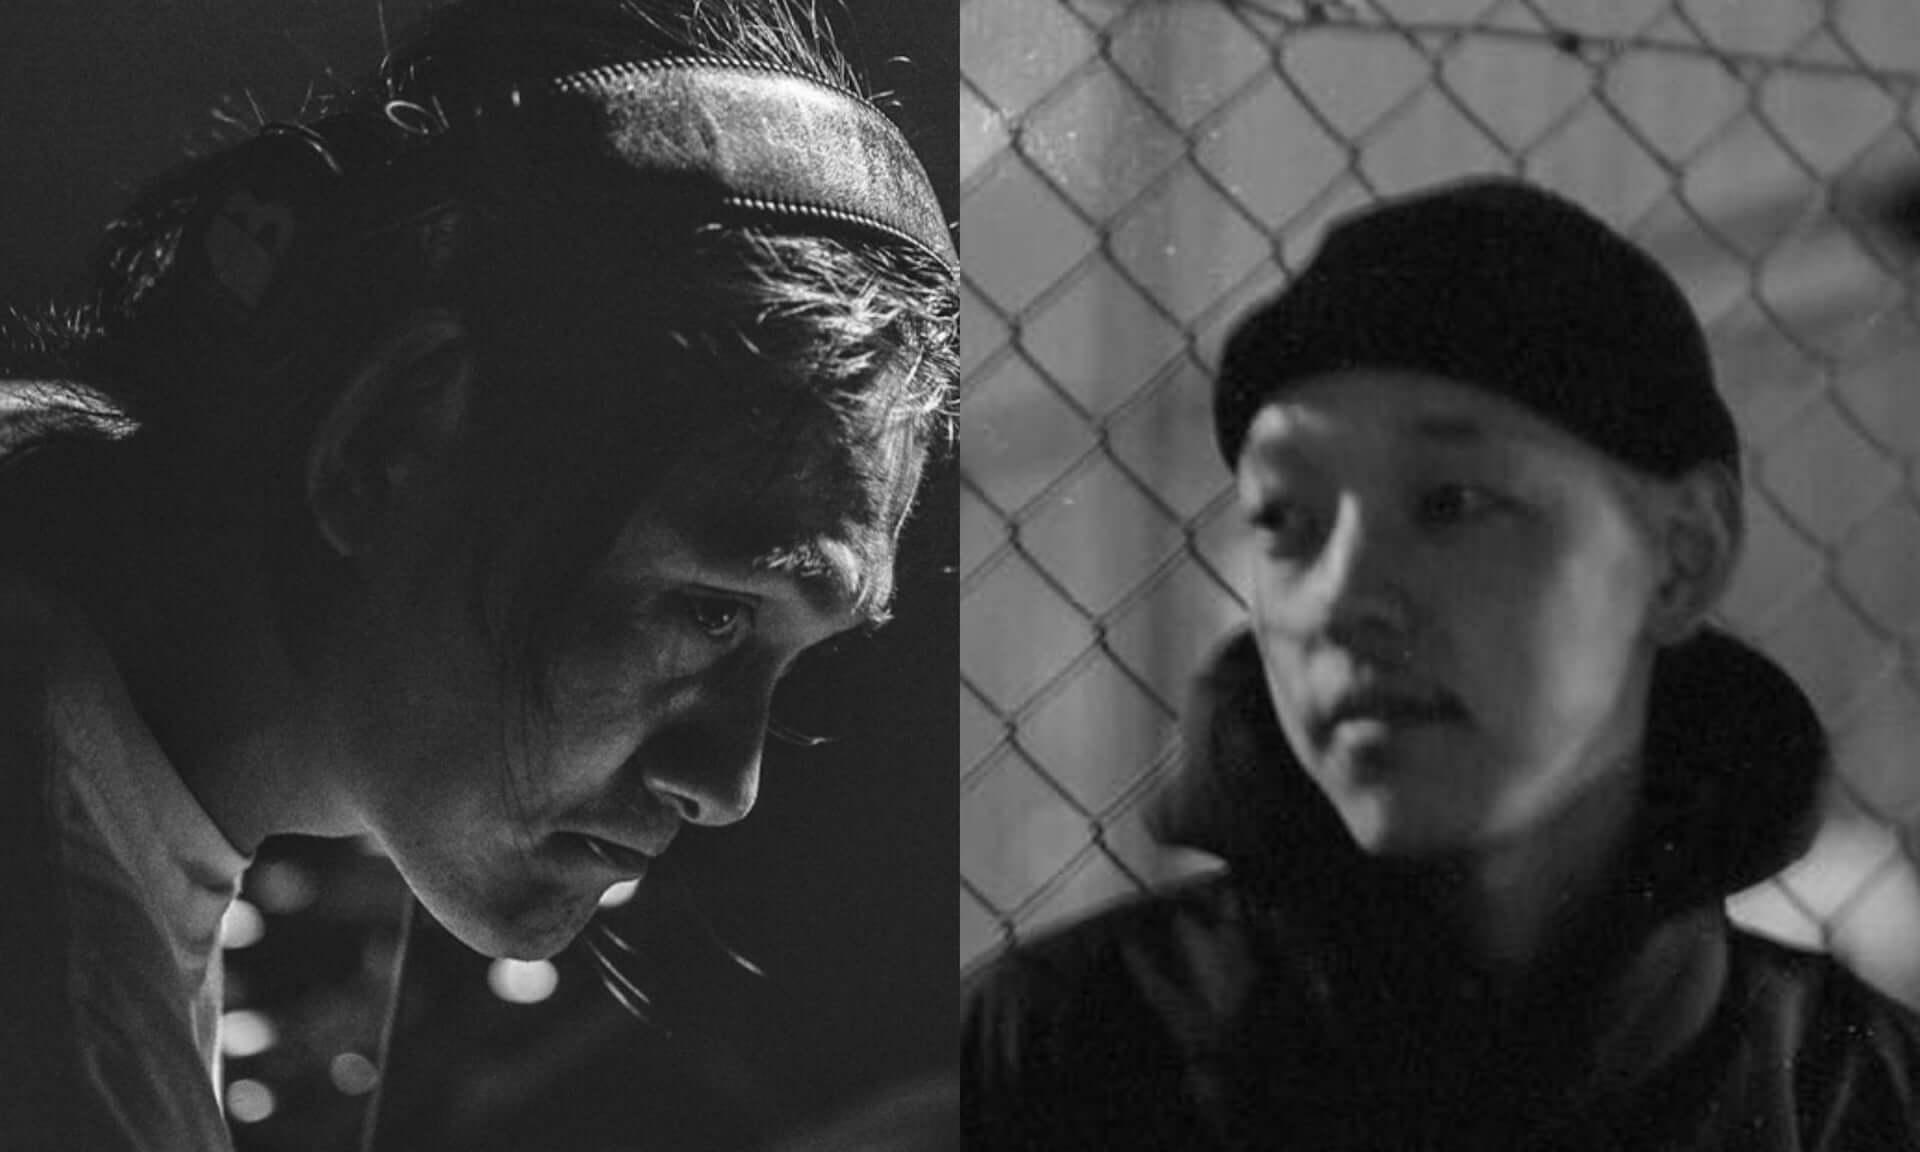 D.J.Fulltonoの東京公演が渋谷Contactで今週末開催!Mars89、GQOMZILLA、mitokonも出演 music200901_contacttokyo-offerta_1-1920x1152